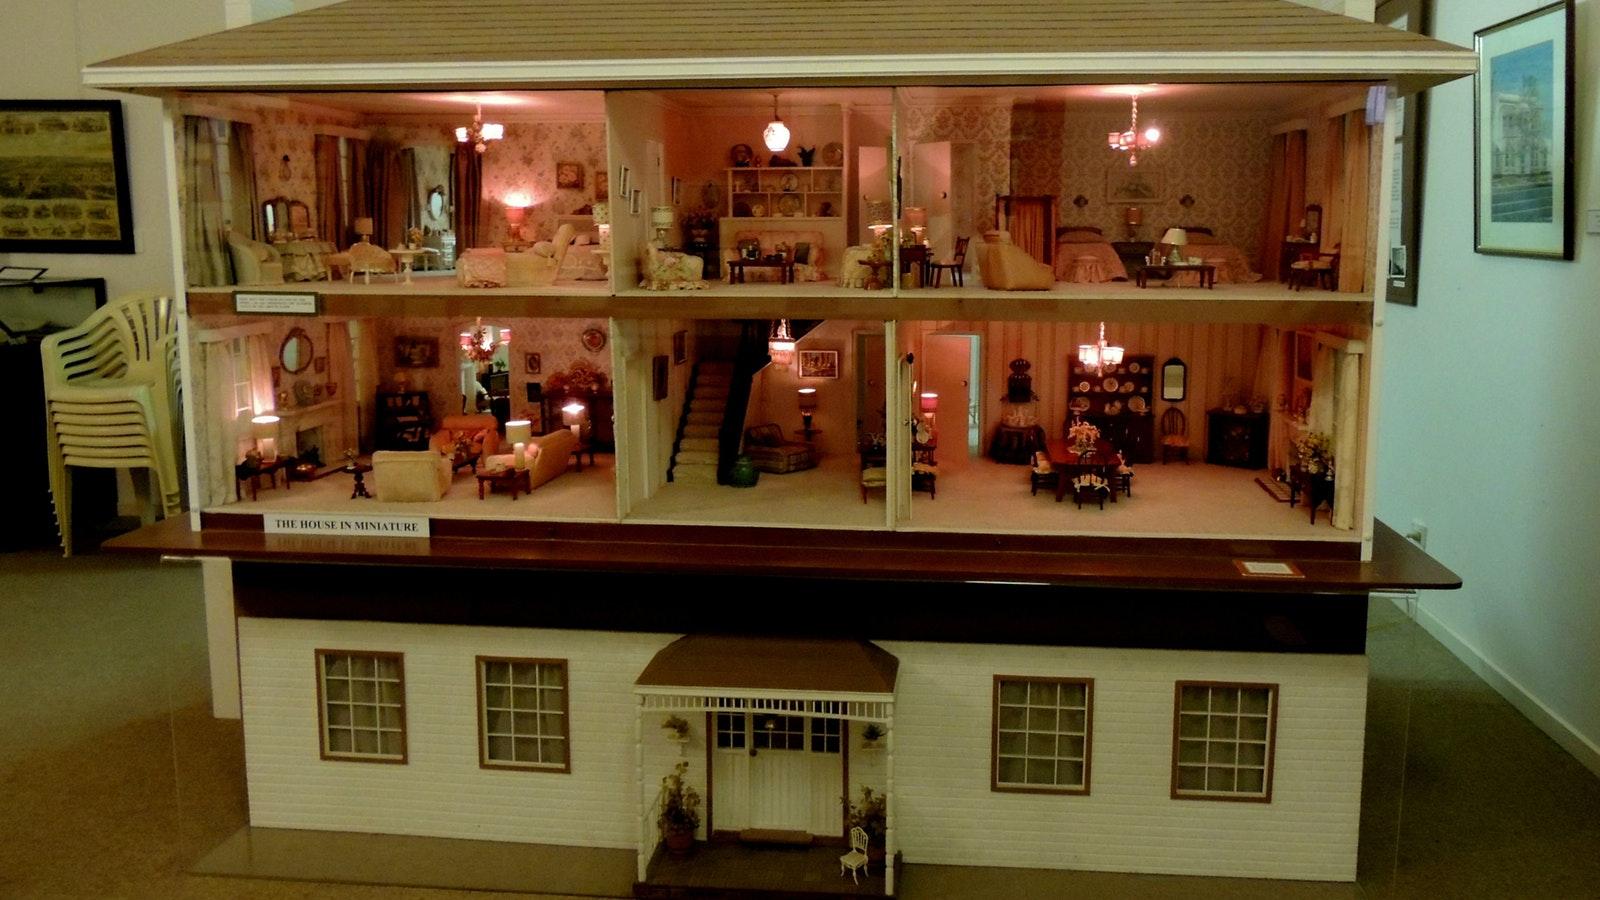 miniature house 1970's